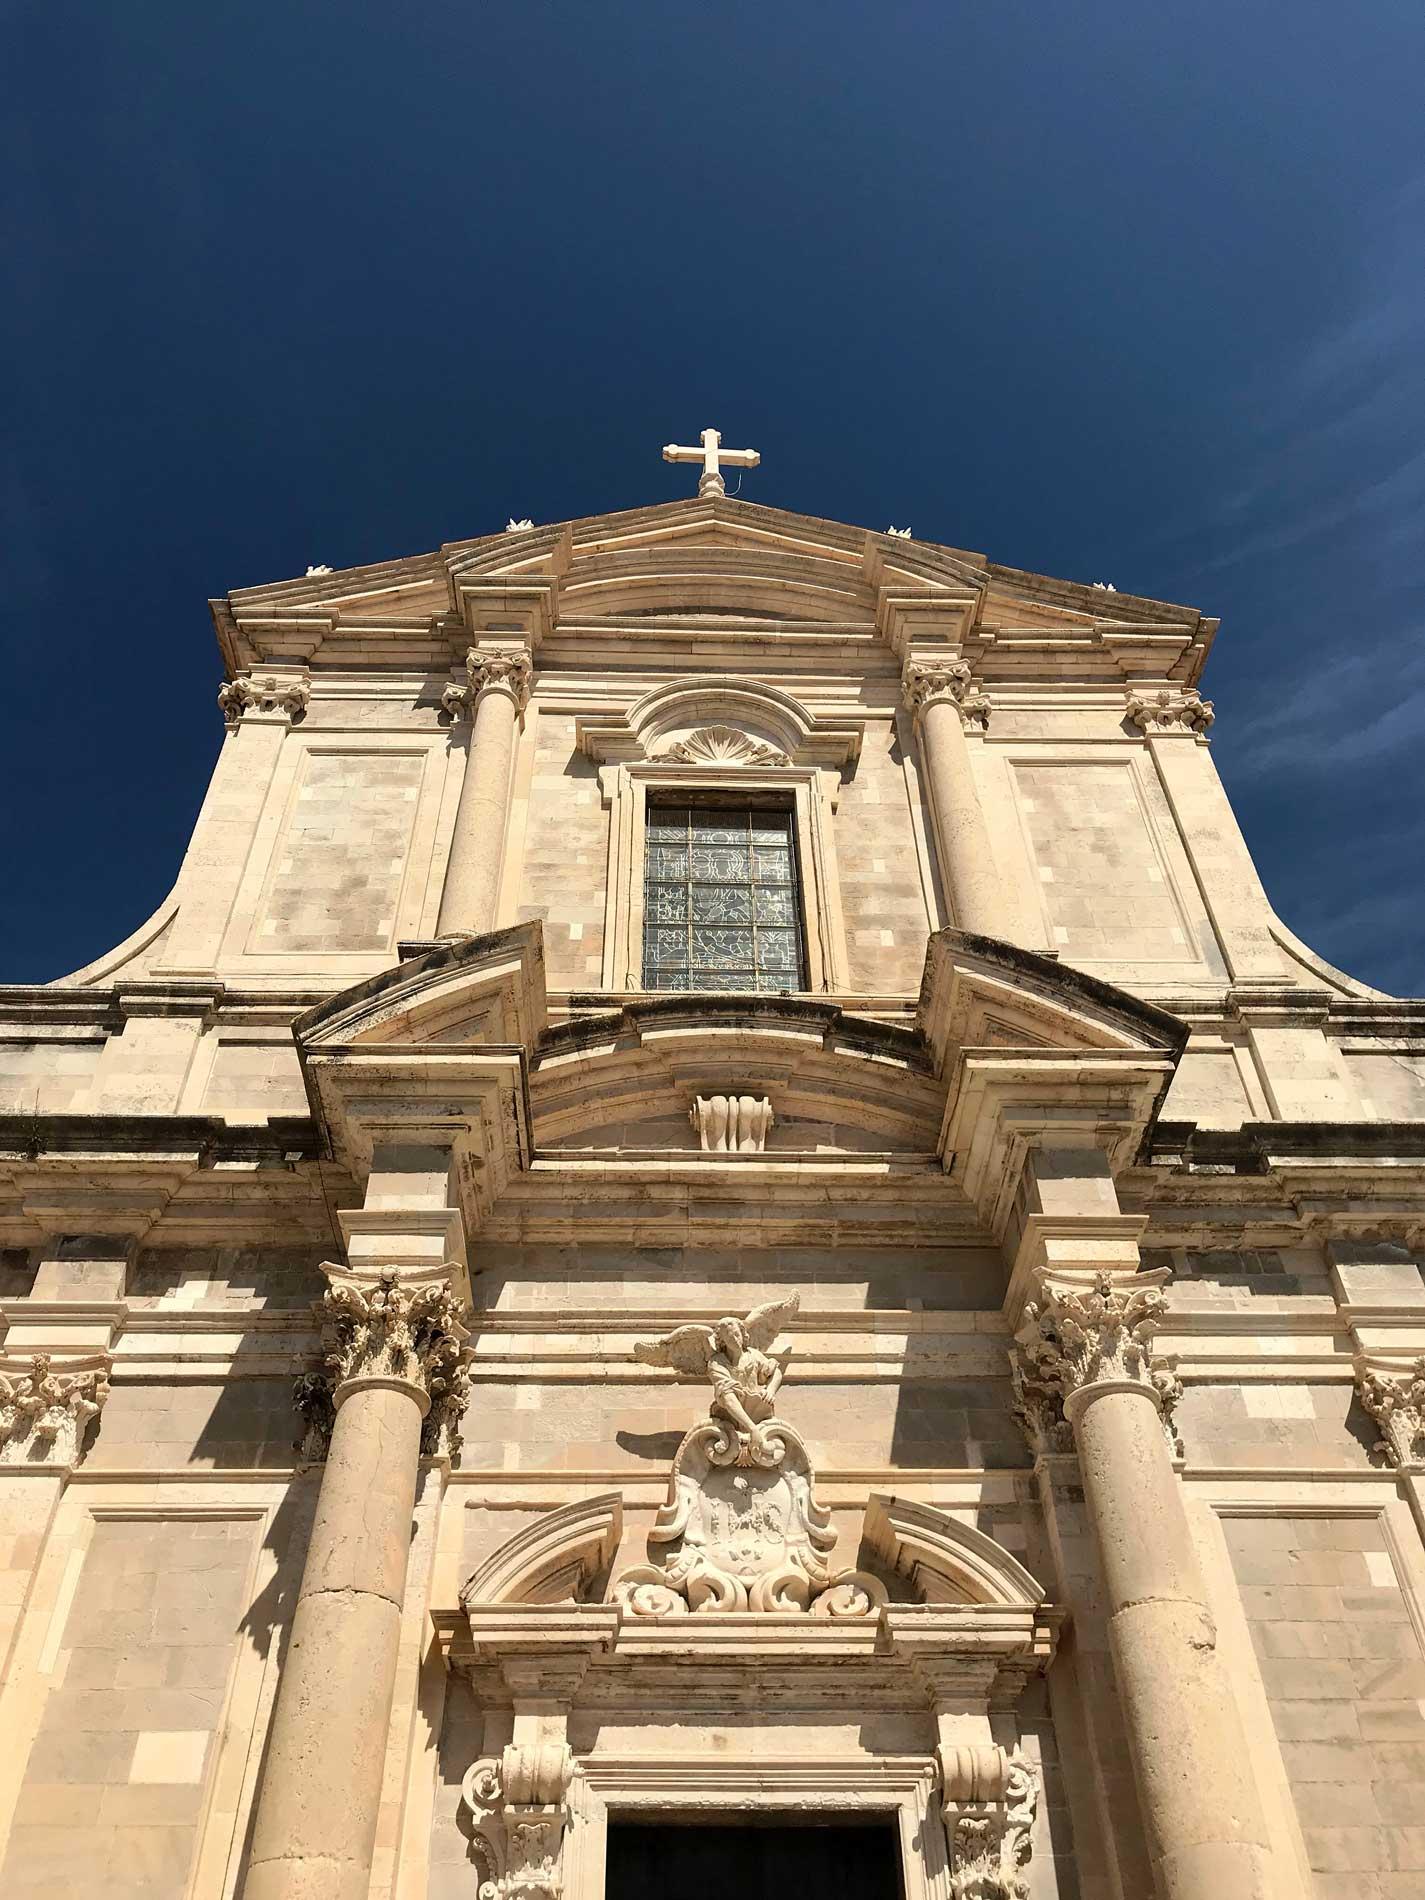 Chiesa-del-Gesu-Dubrovnik-facciata-barocca-cielo-blu